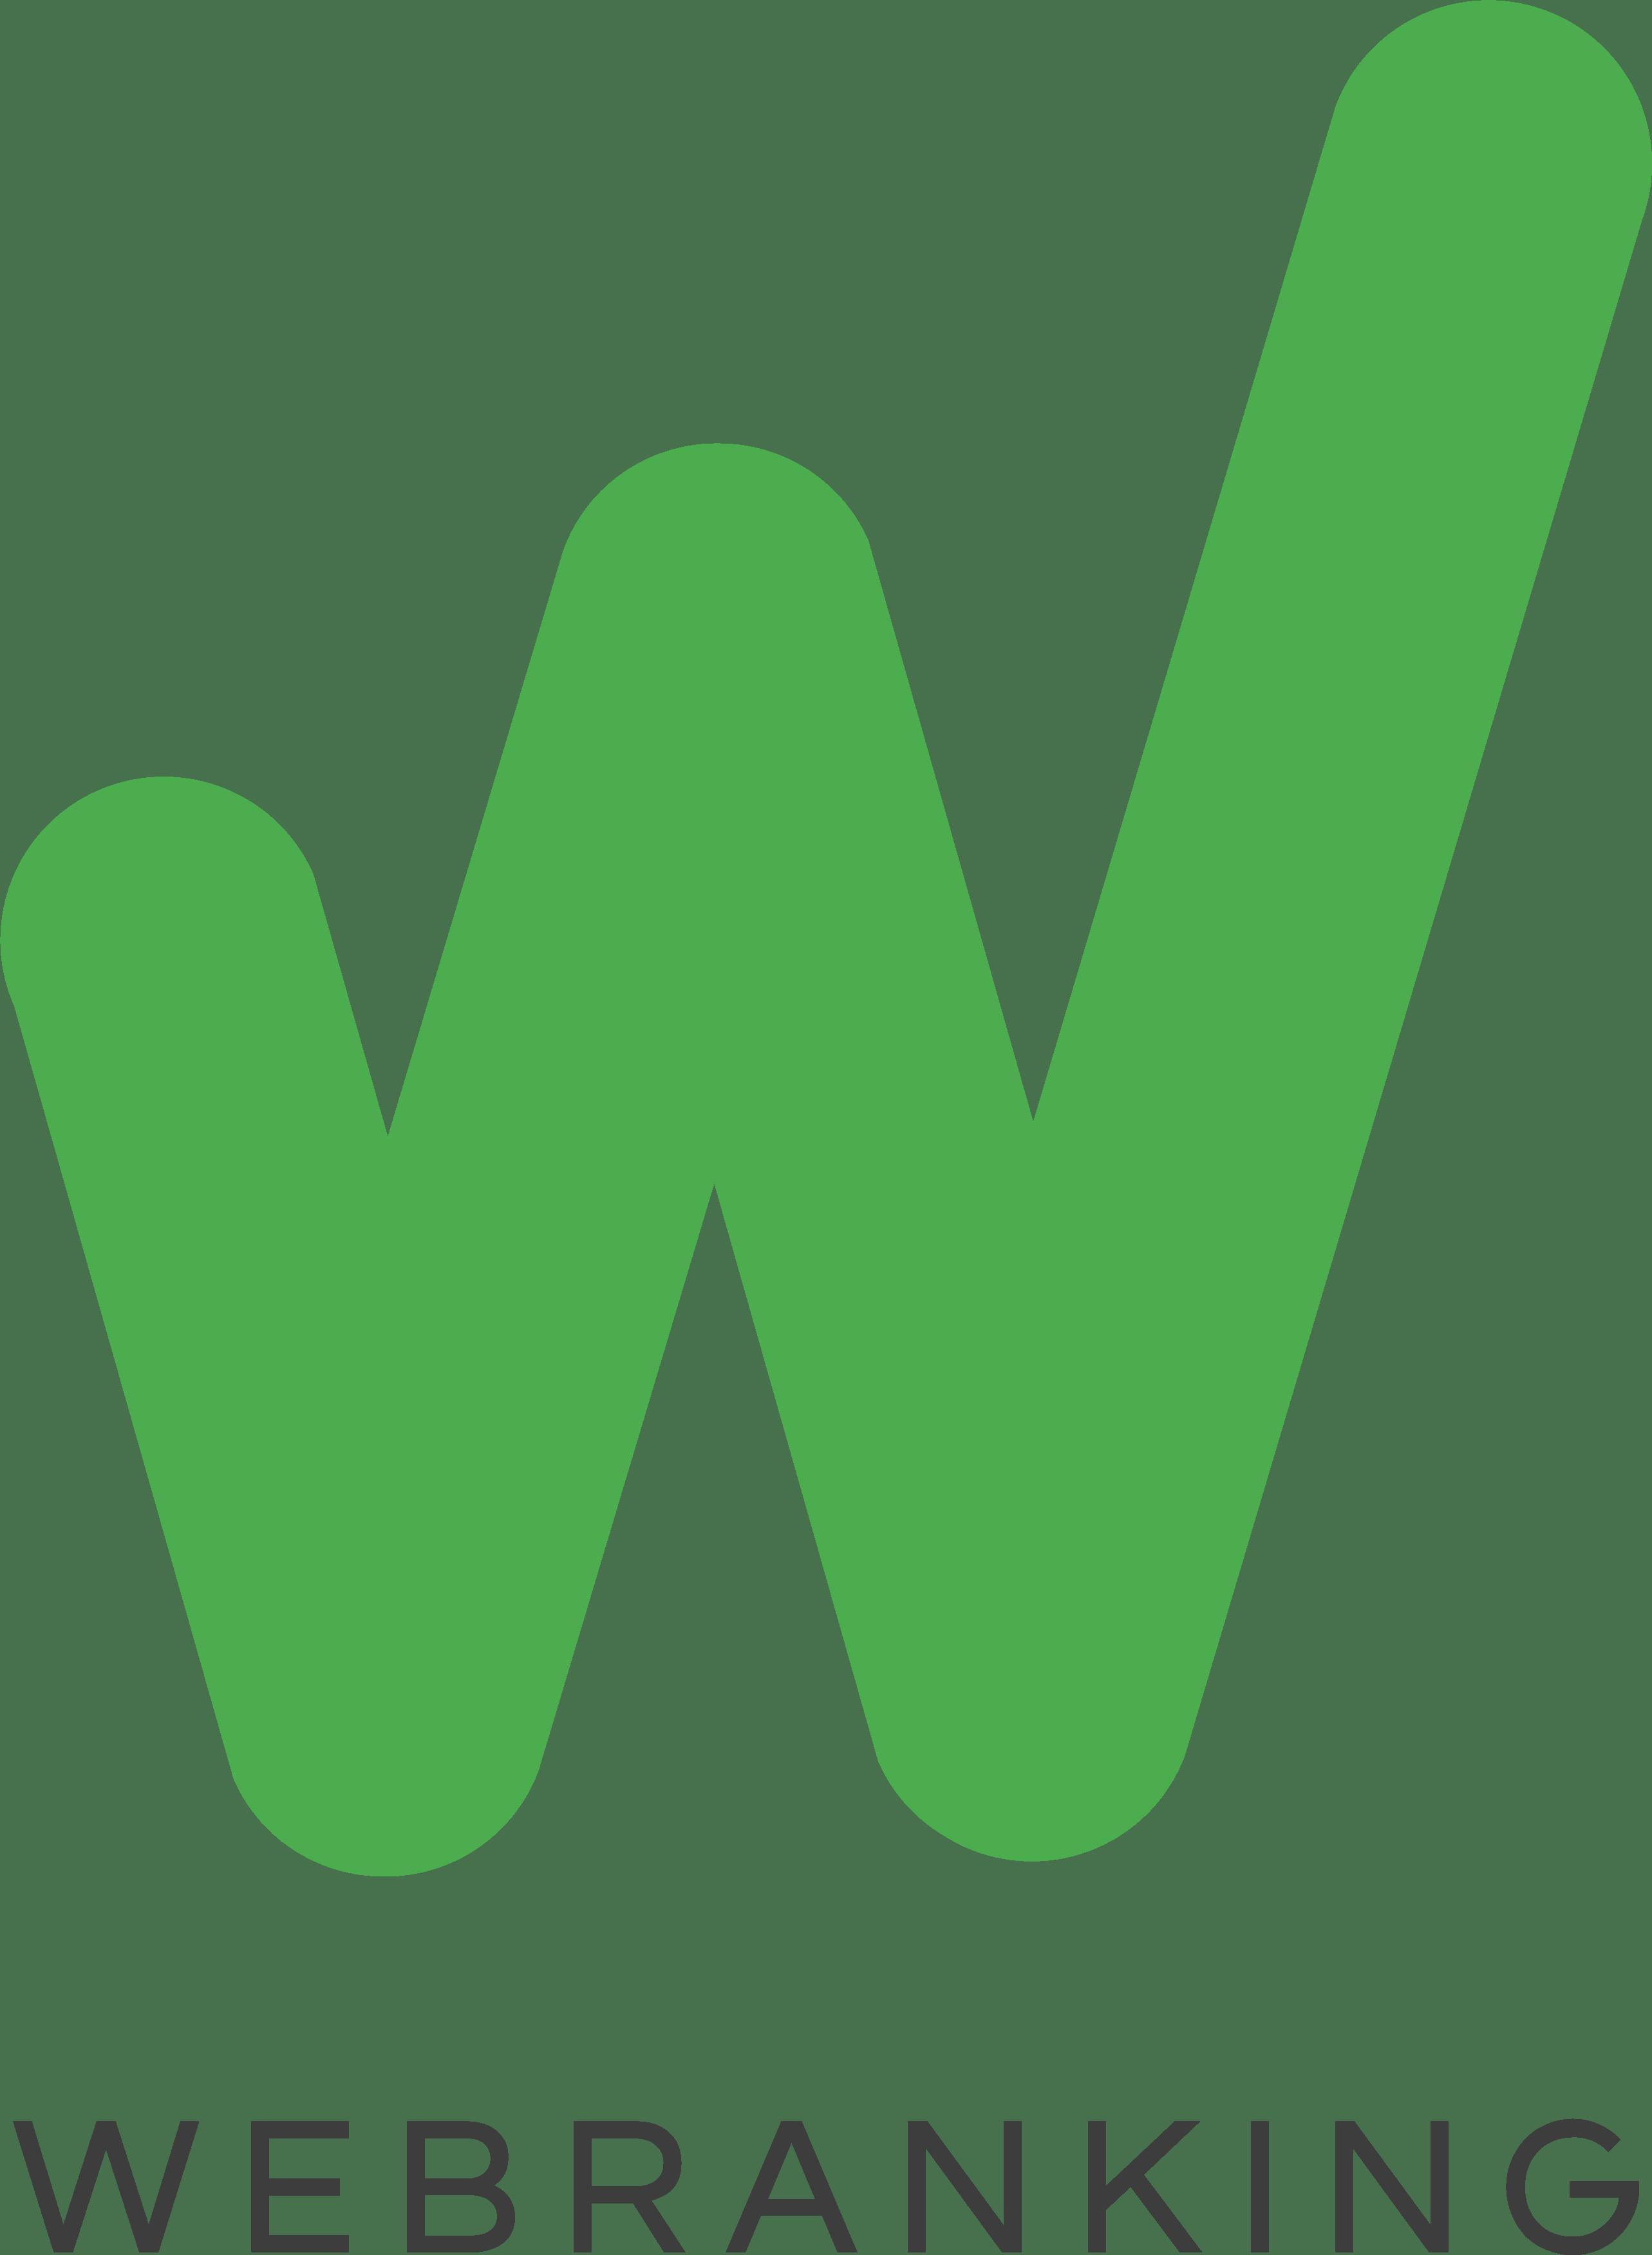 Webranking